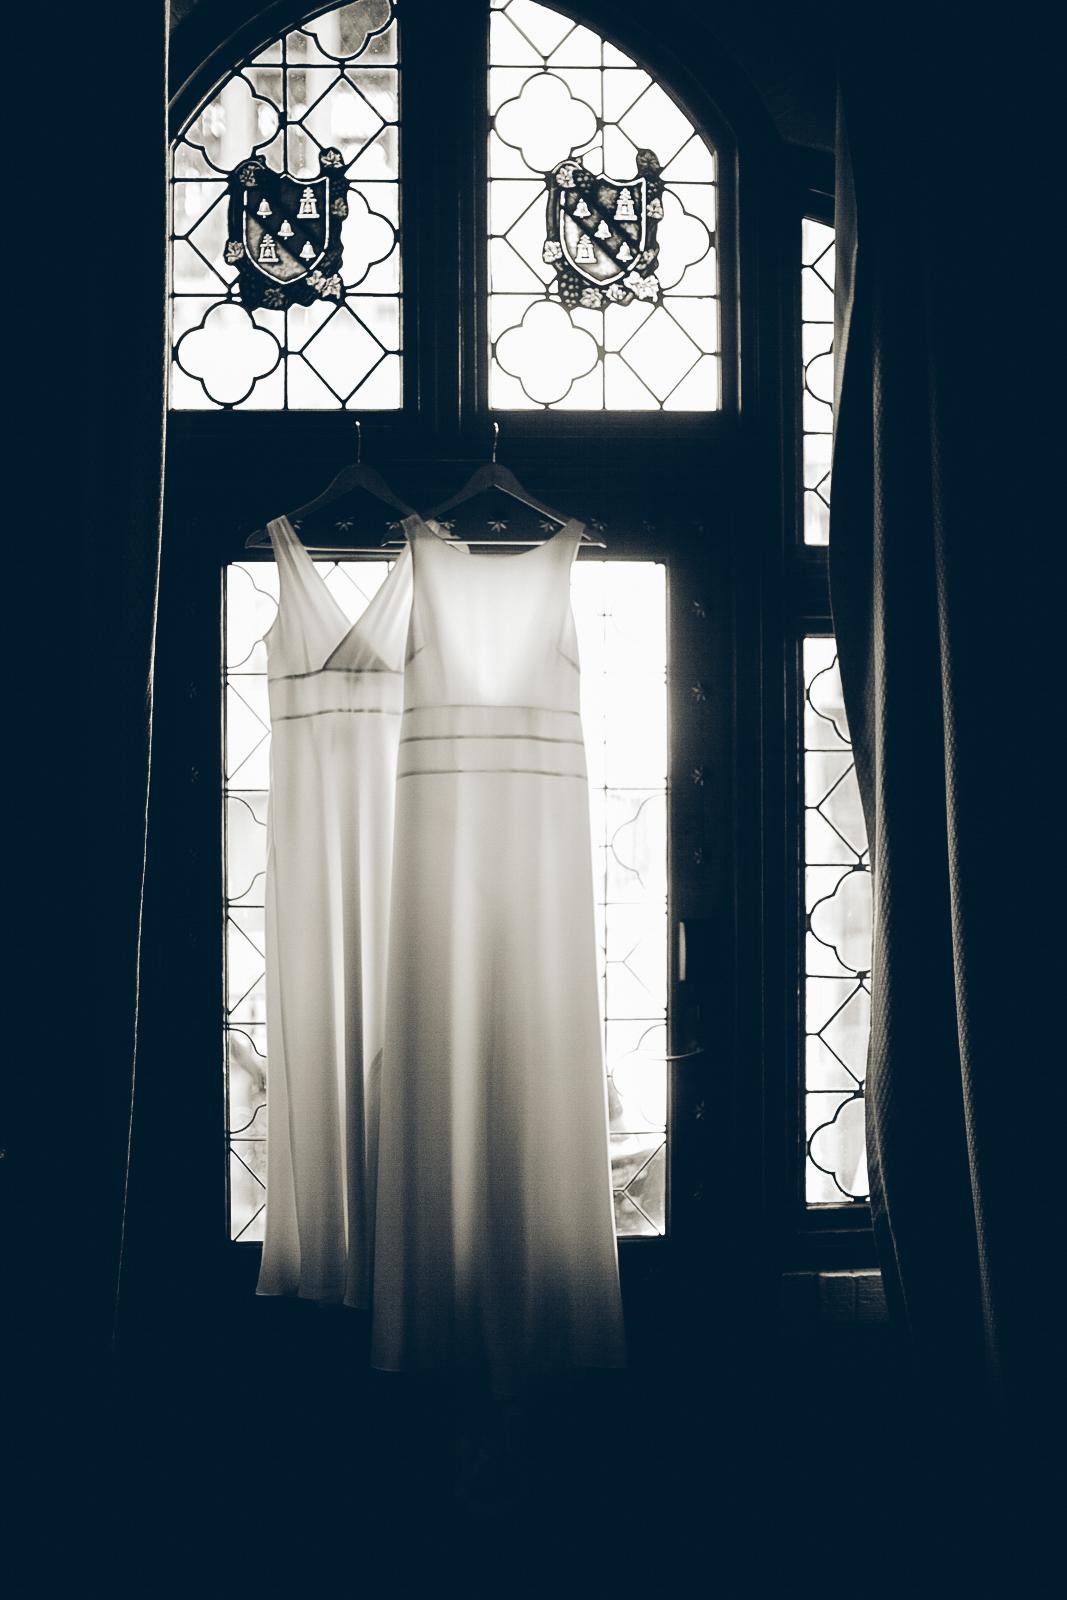 Riverside_ca_wedding_photography_marguerite_carolyn_ebony_siovhan_bokeh_photography_01.jpg